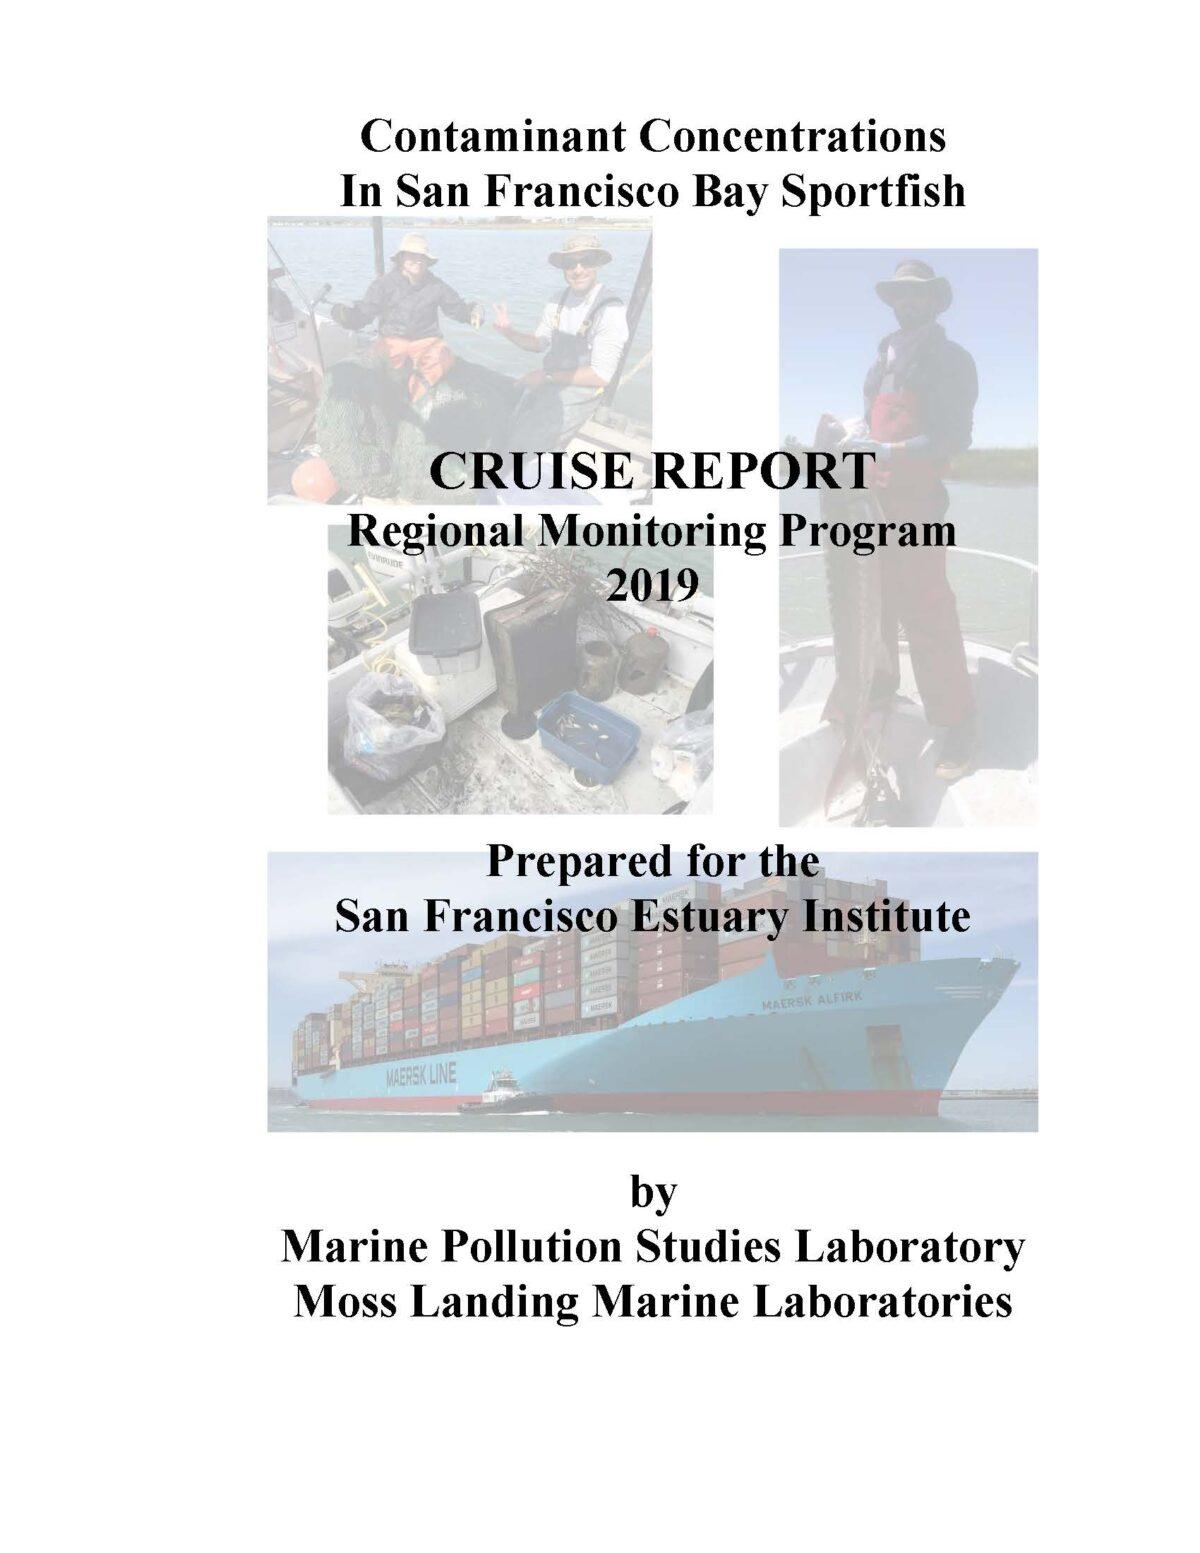 Contaminant Concentrations in San Francisco Bay Sportfish, Cruise Report Regional Monitoring Program (RMP) 2019